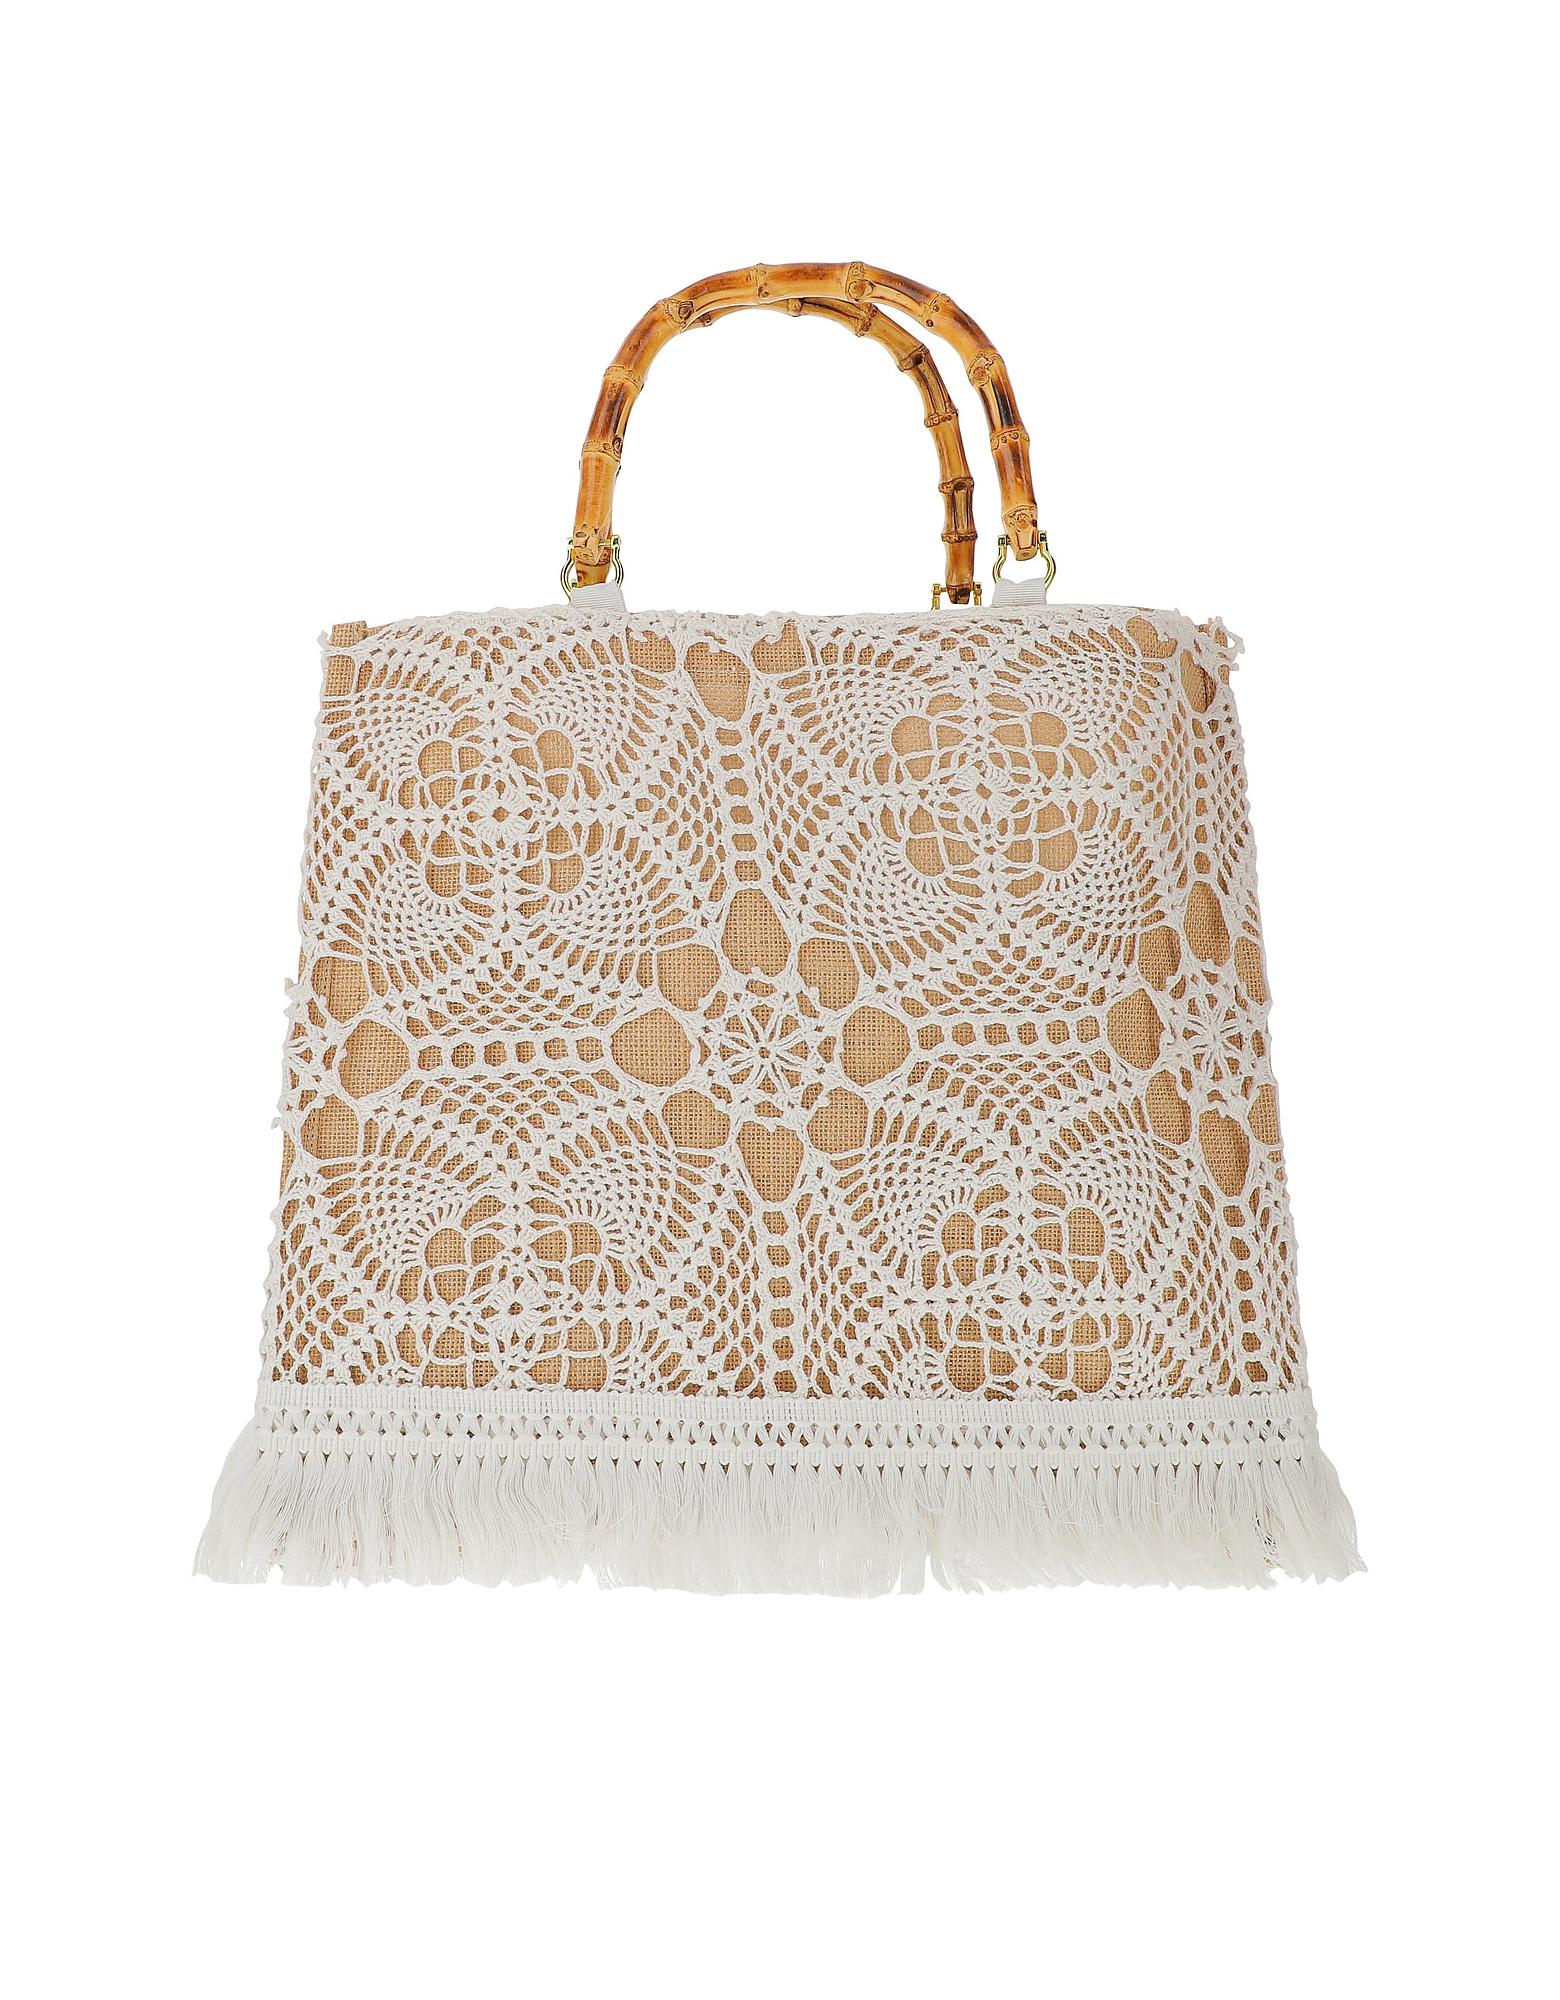 LaMILANESA Designer Handbags, Natural Crochet Tote Bag